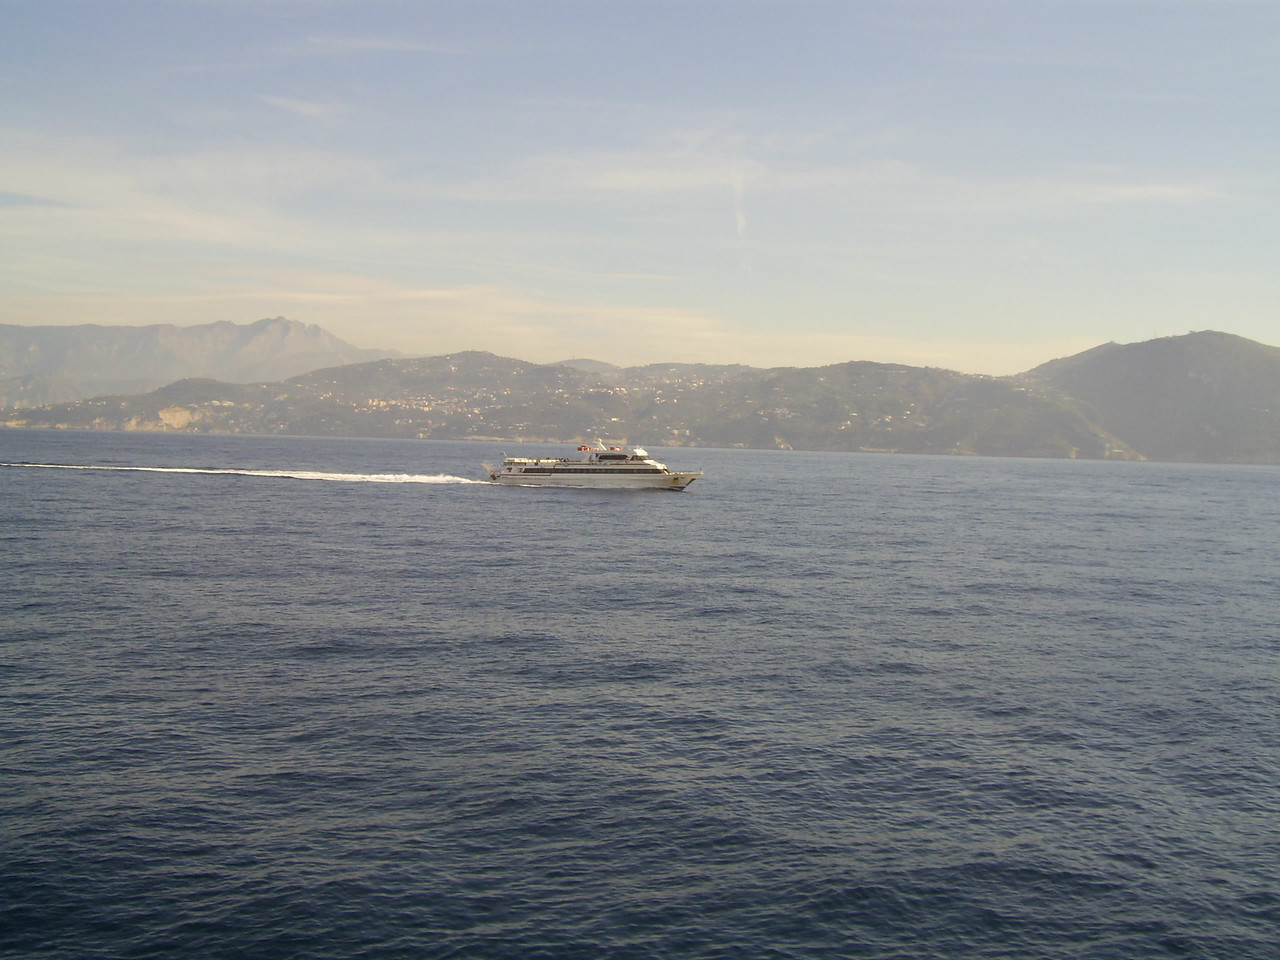 2007 - AMALFI JET sailing from Napoli to Capri.